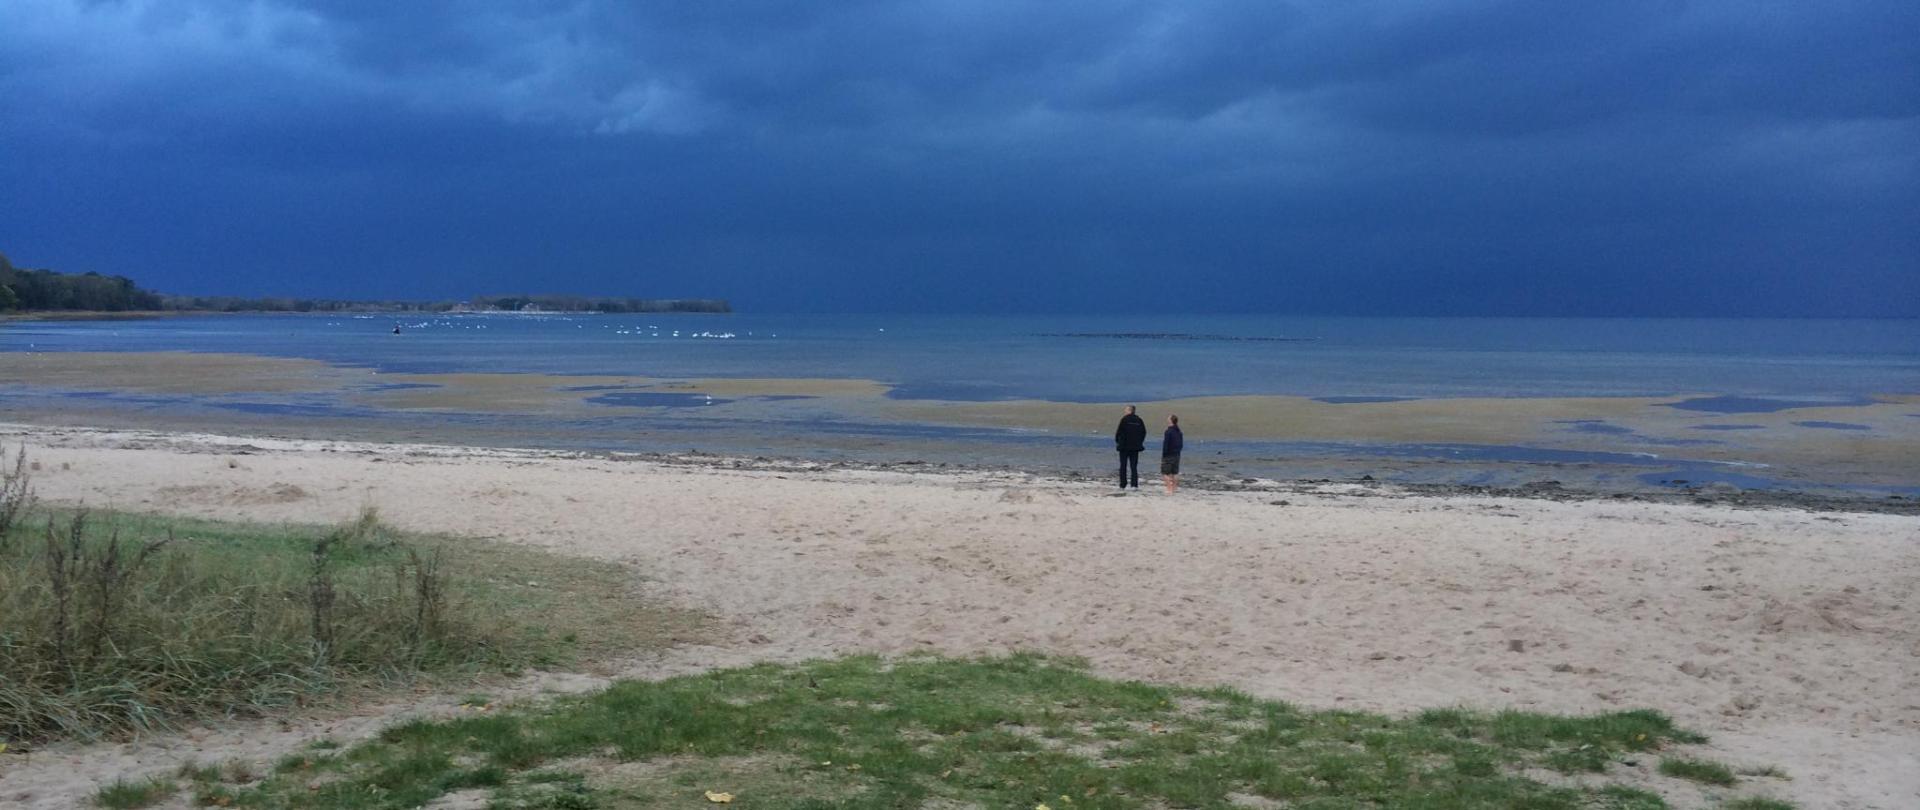 Strand bei Sturm.jpg